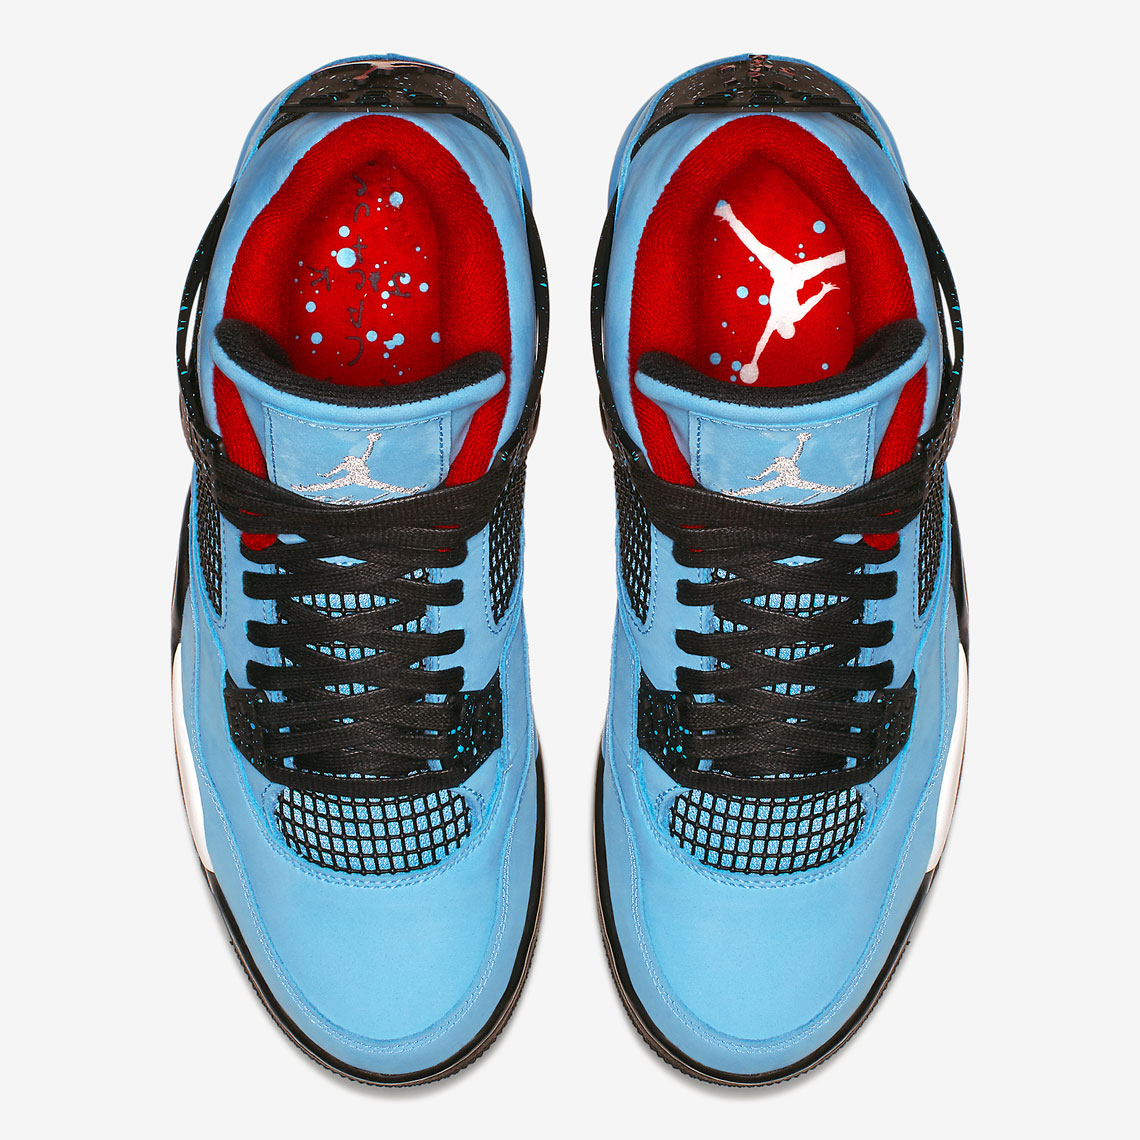 Travis Scott x Air Jordan 4 Release Info | SneakerNews.com